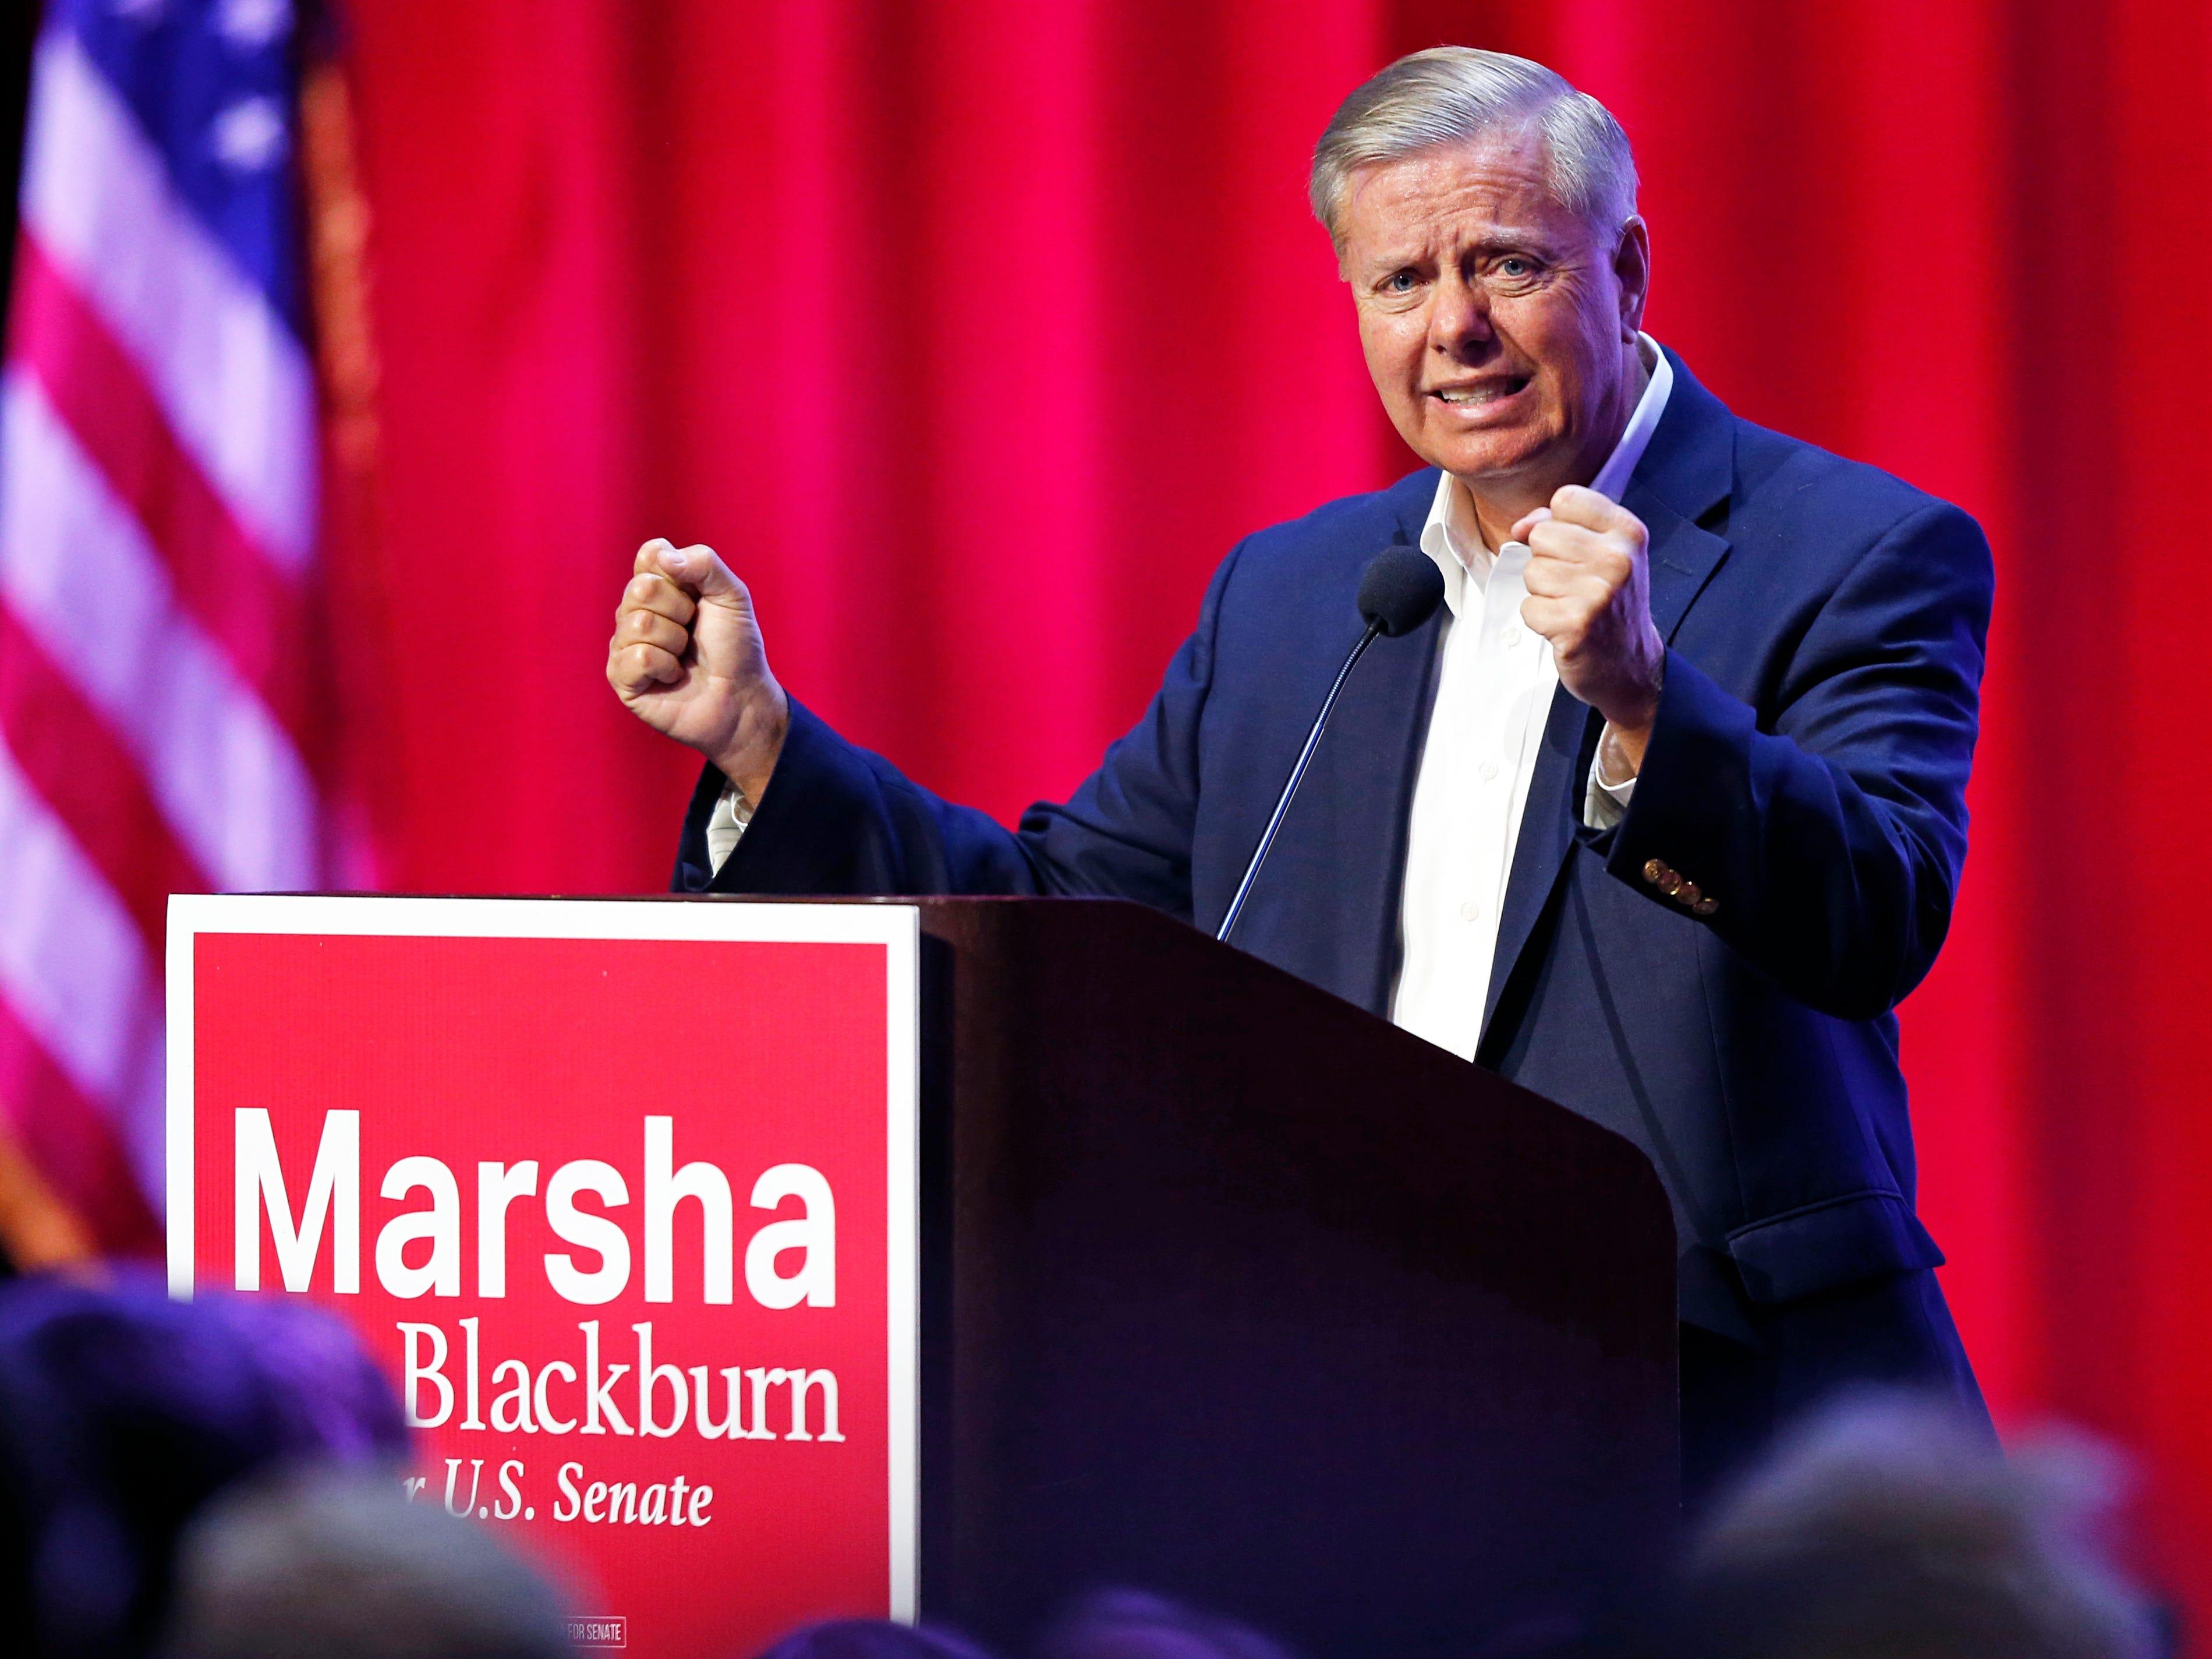 U.S. Sen.Lindsey Graham, R-S.C., gestures as he speaks during a campaign event for Republican U.S. Senate candidate Marsha Blackburn Sunday, Oct. 28, 2018, in Nashville, Tenn.